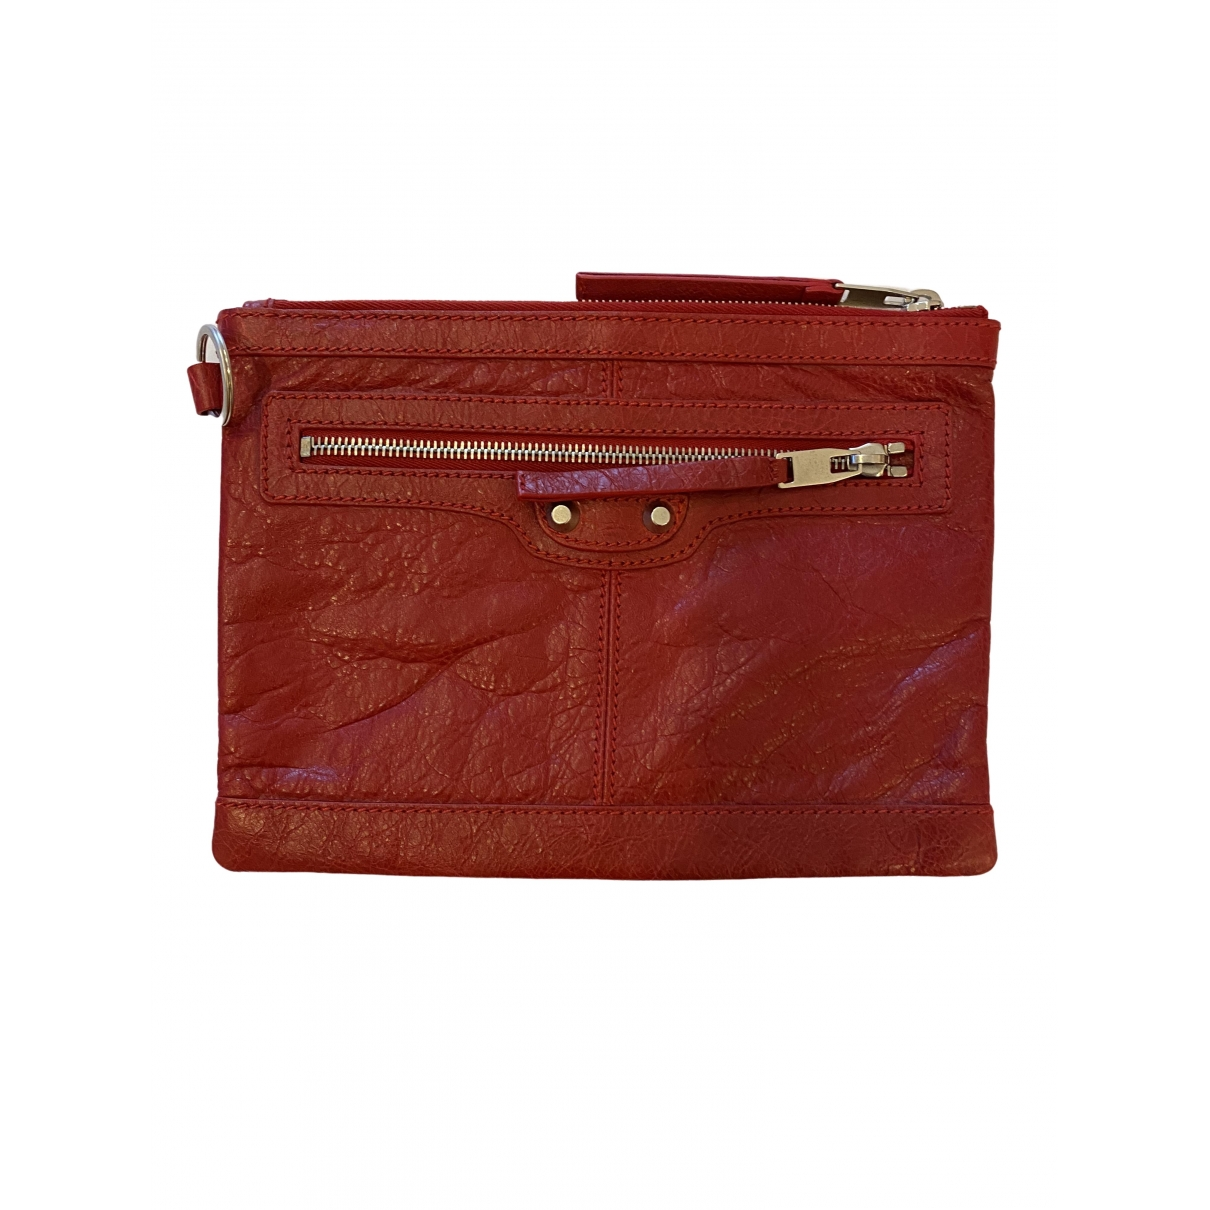 Balenciaga \N Red Leather Clutch bag for Women \N